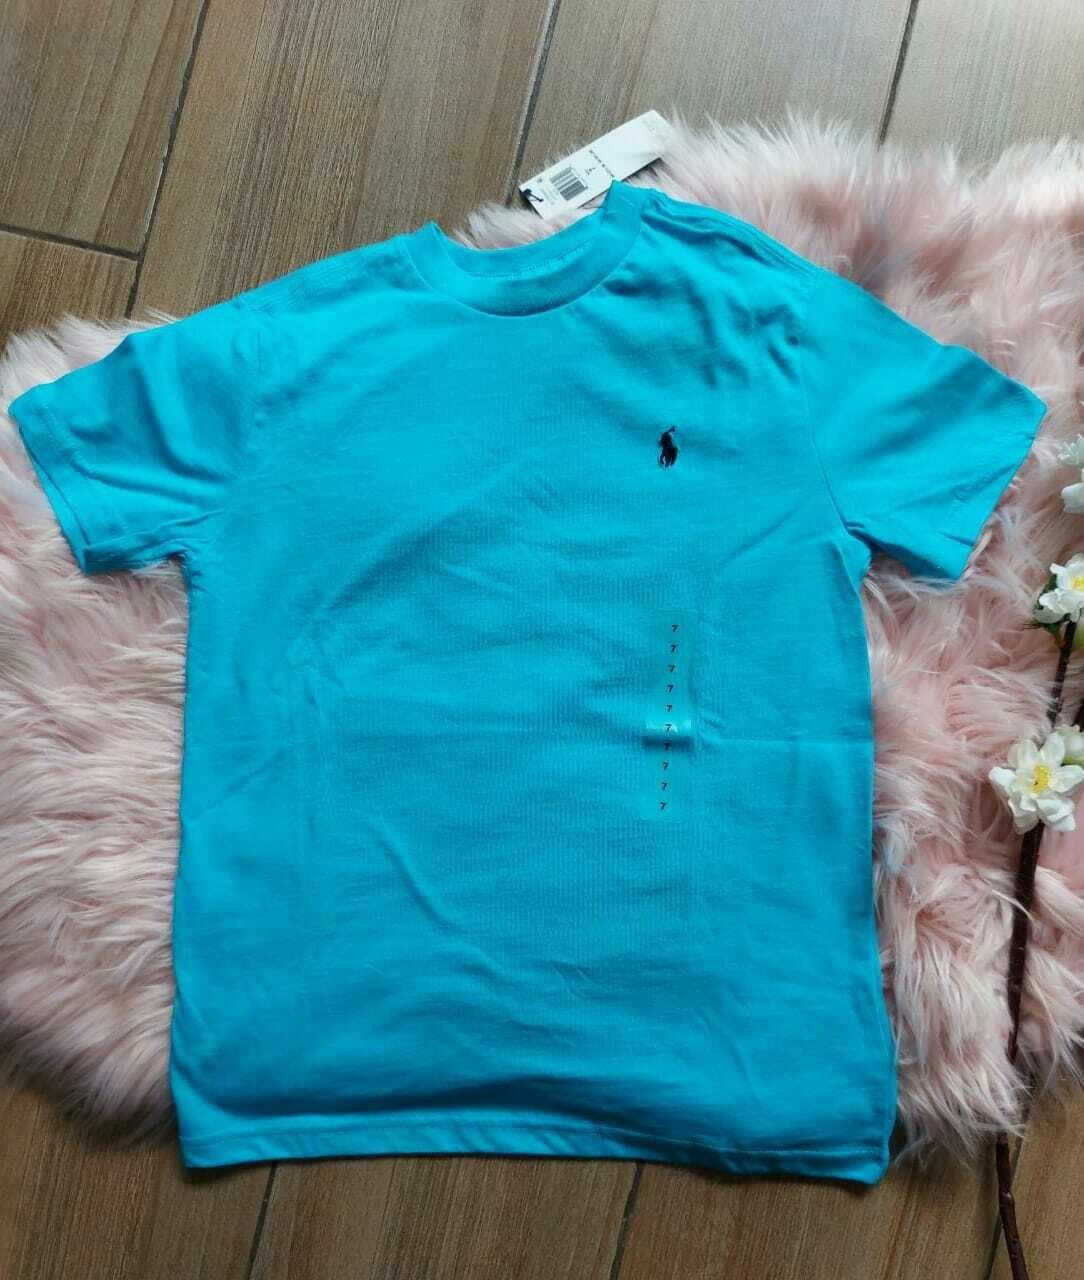 Camiseta turquesa, 7 años